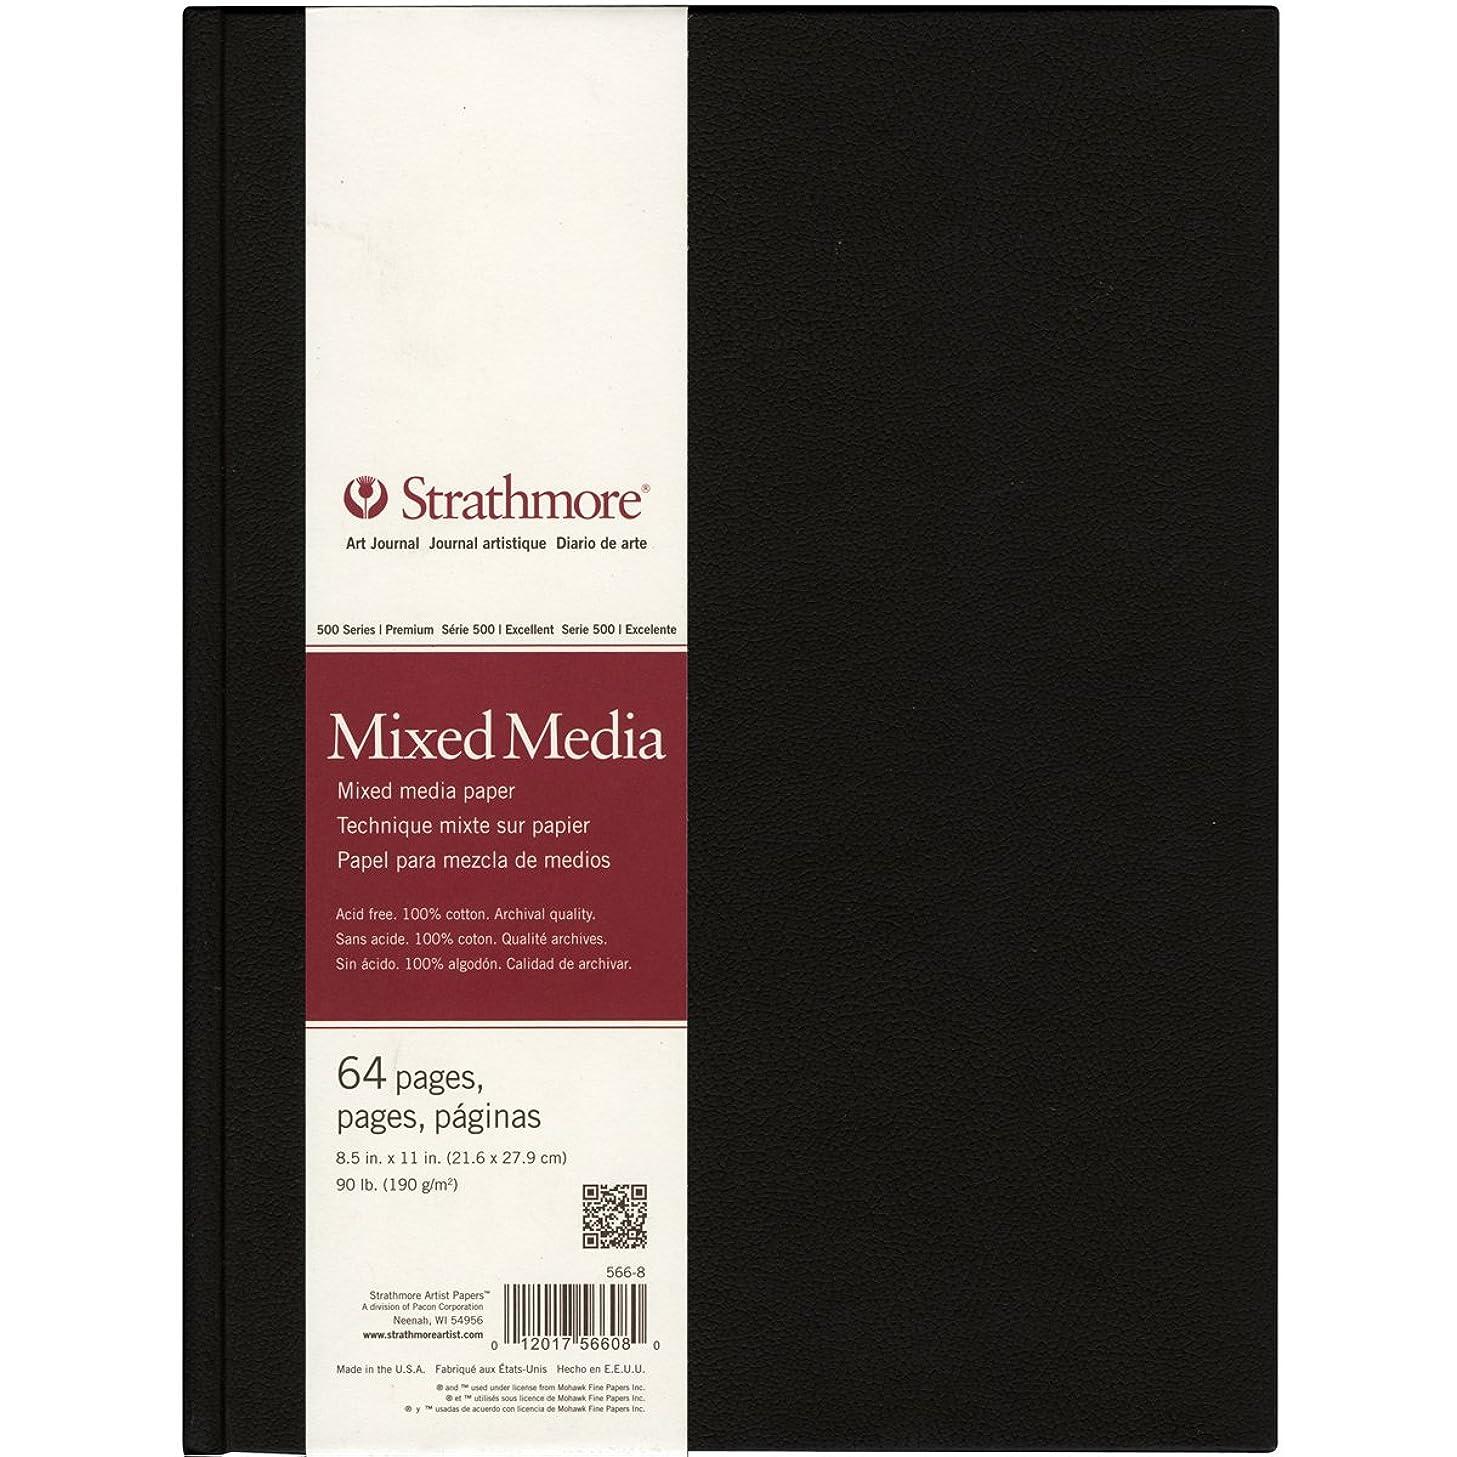 Strathmore 566-8 500 Series Hardbound Mixed Media Art Journal, 8.5